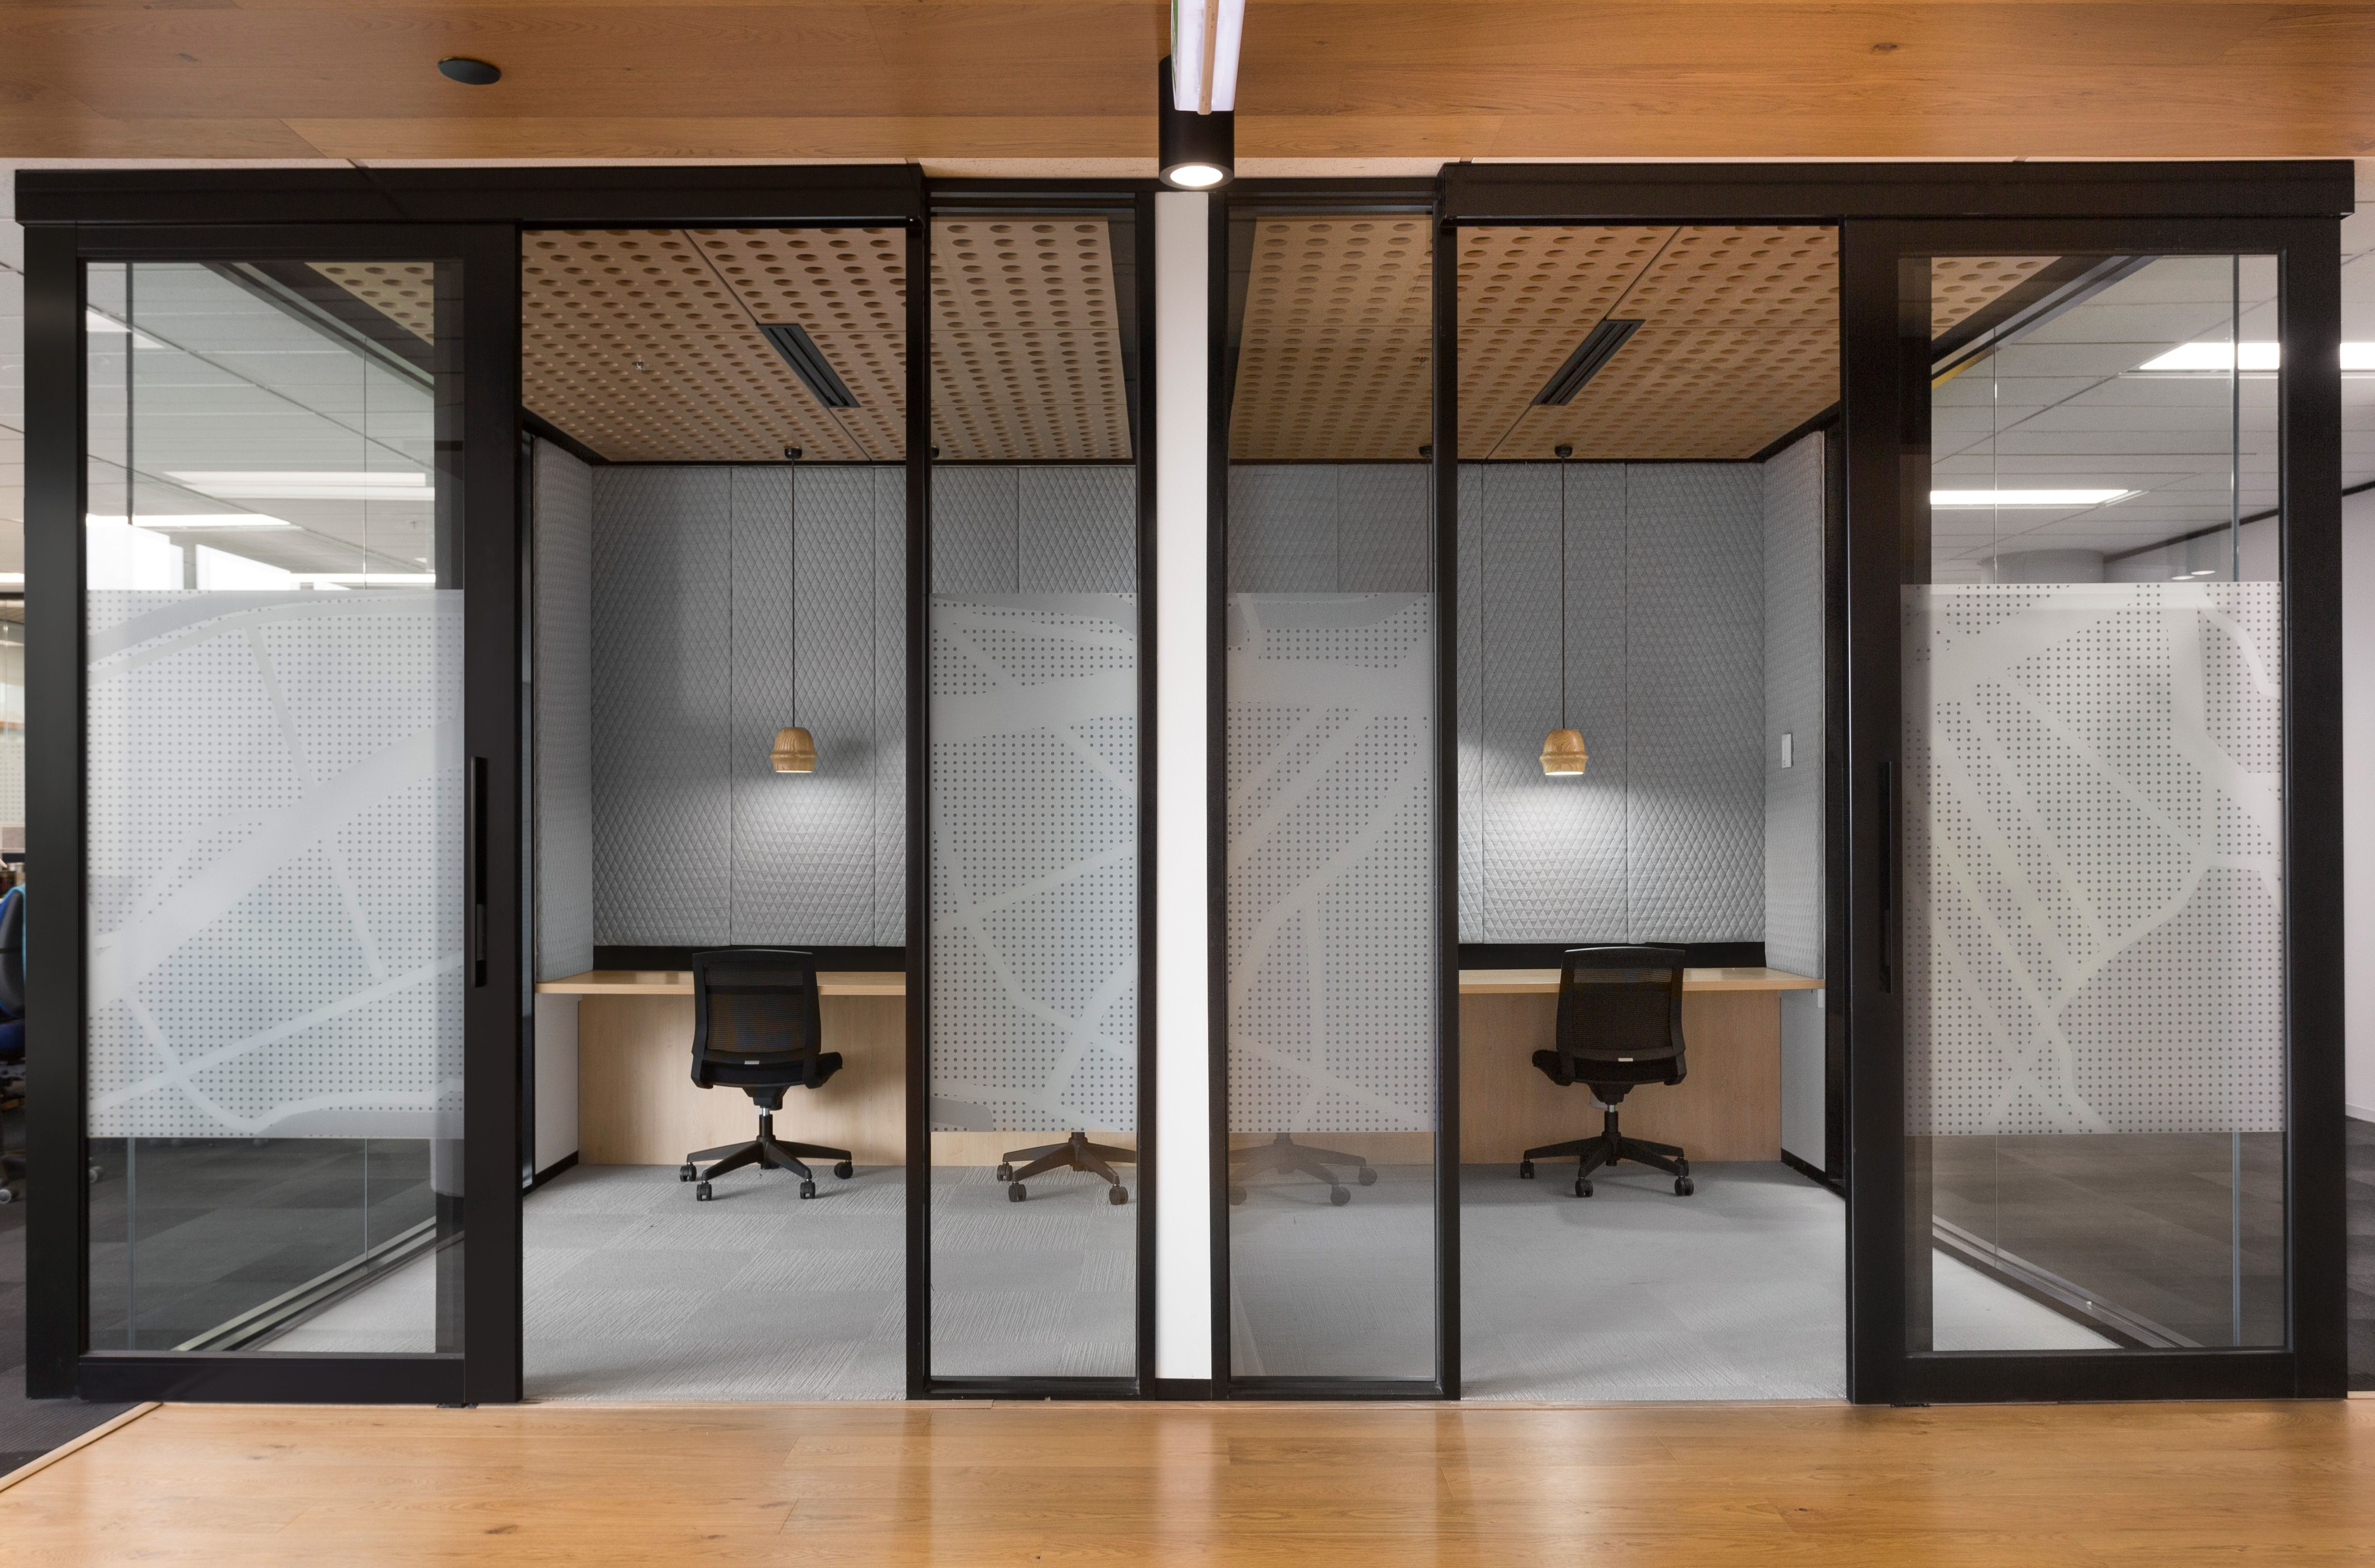 Office Design | Workplace Interior featuring Timber, Innofa Fabrics, Ross Didier lights. Hot Black Interior Design